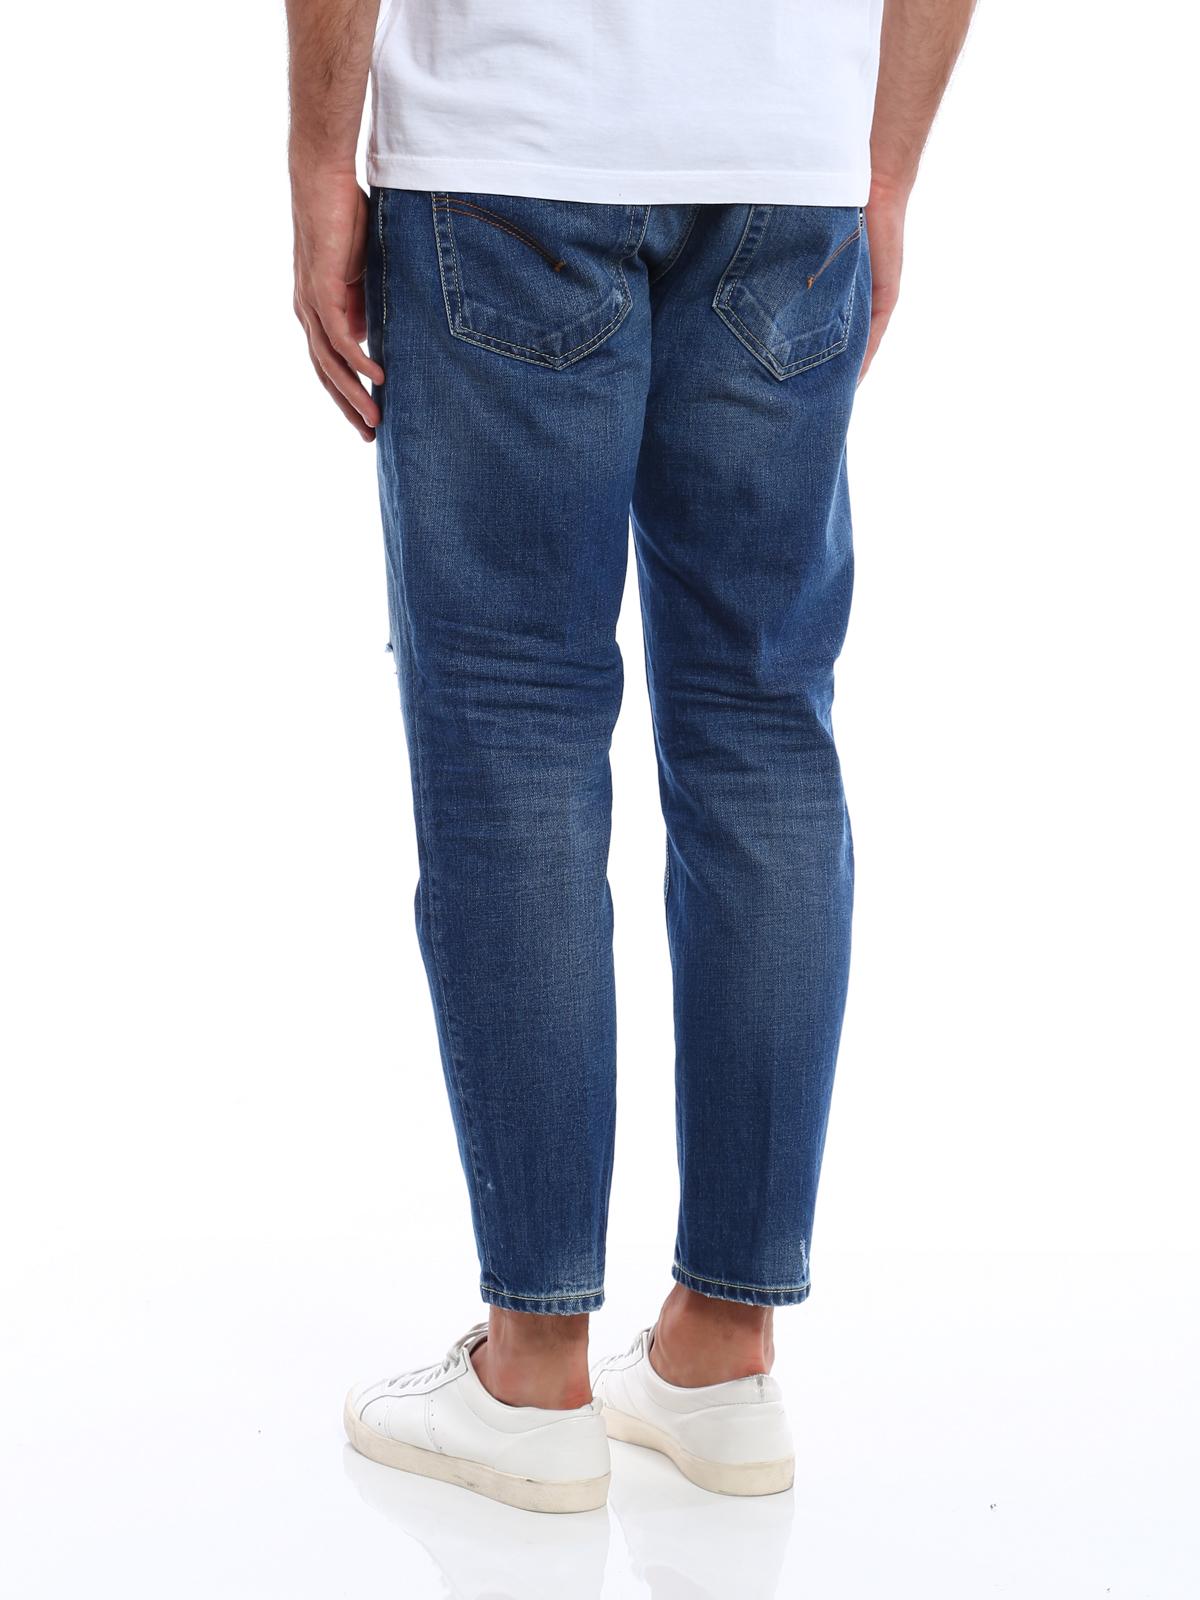 Jeans Brighton blue Dondup PJgxzJopxS